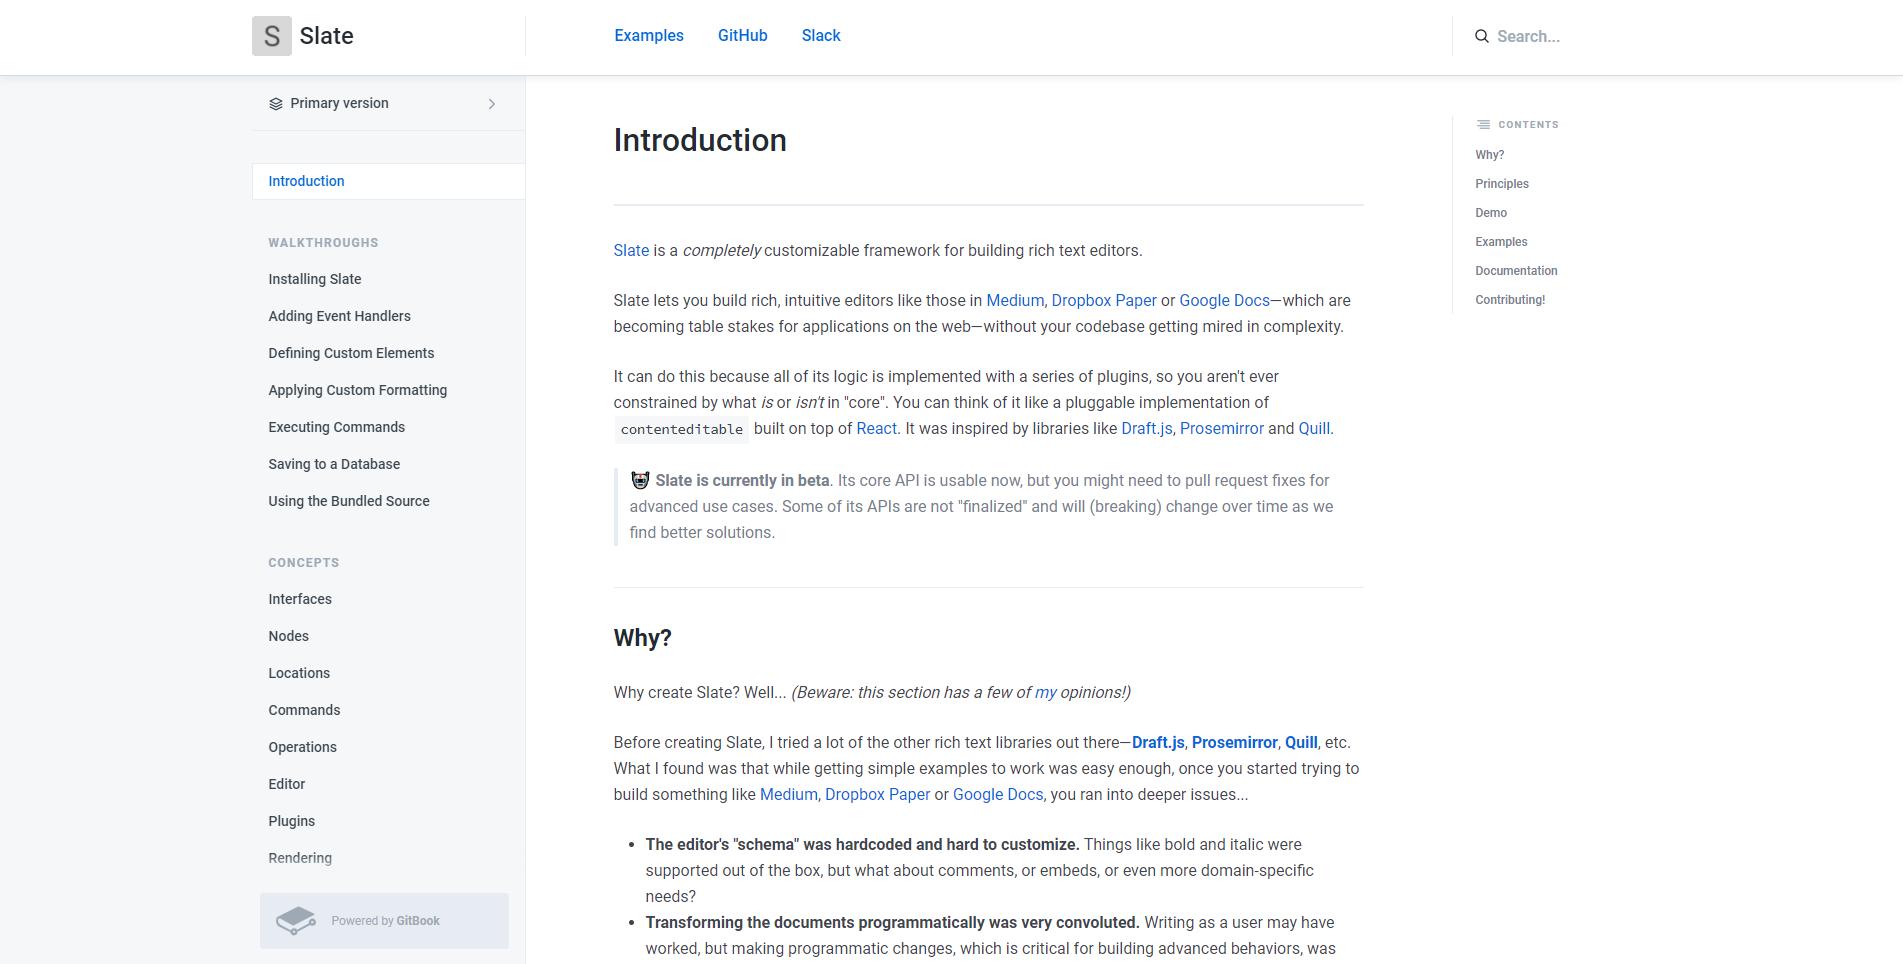 Slate documentation